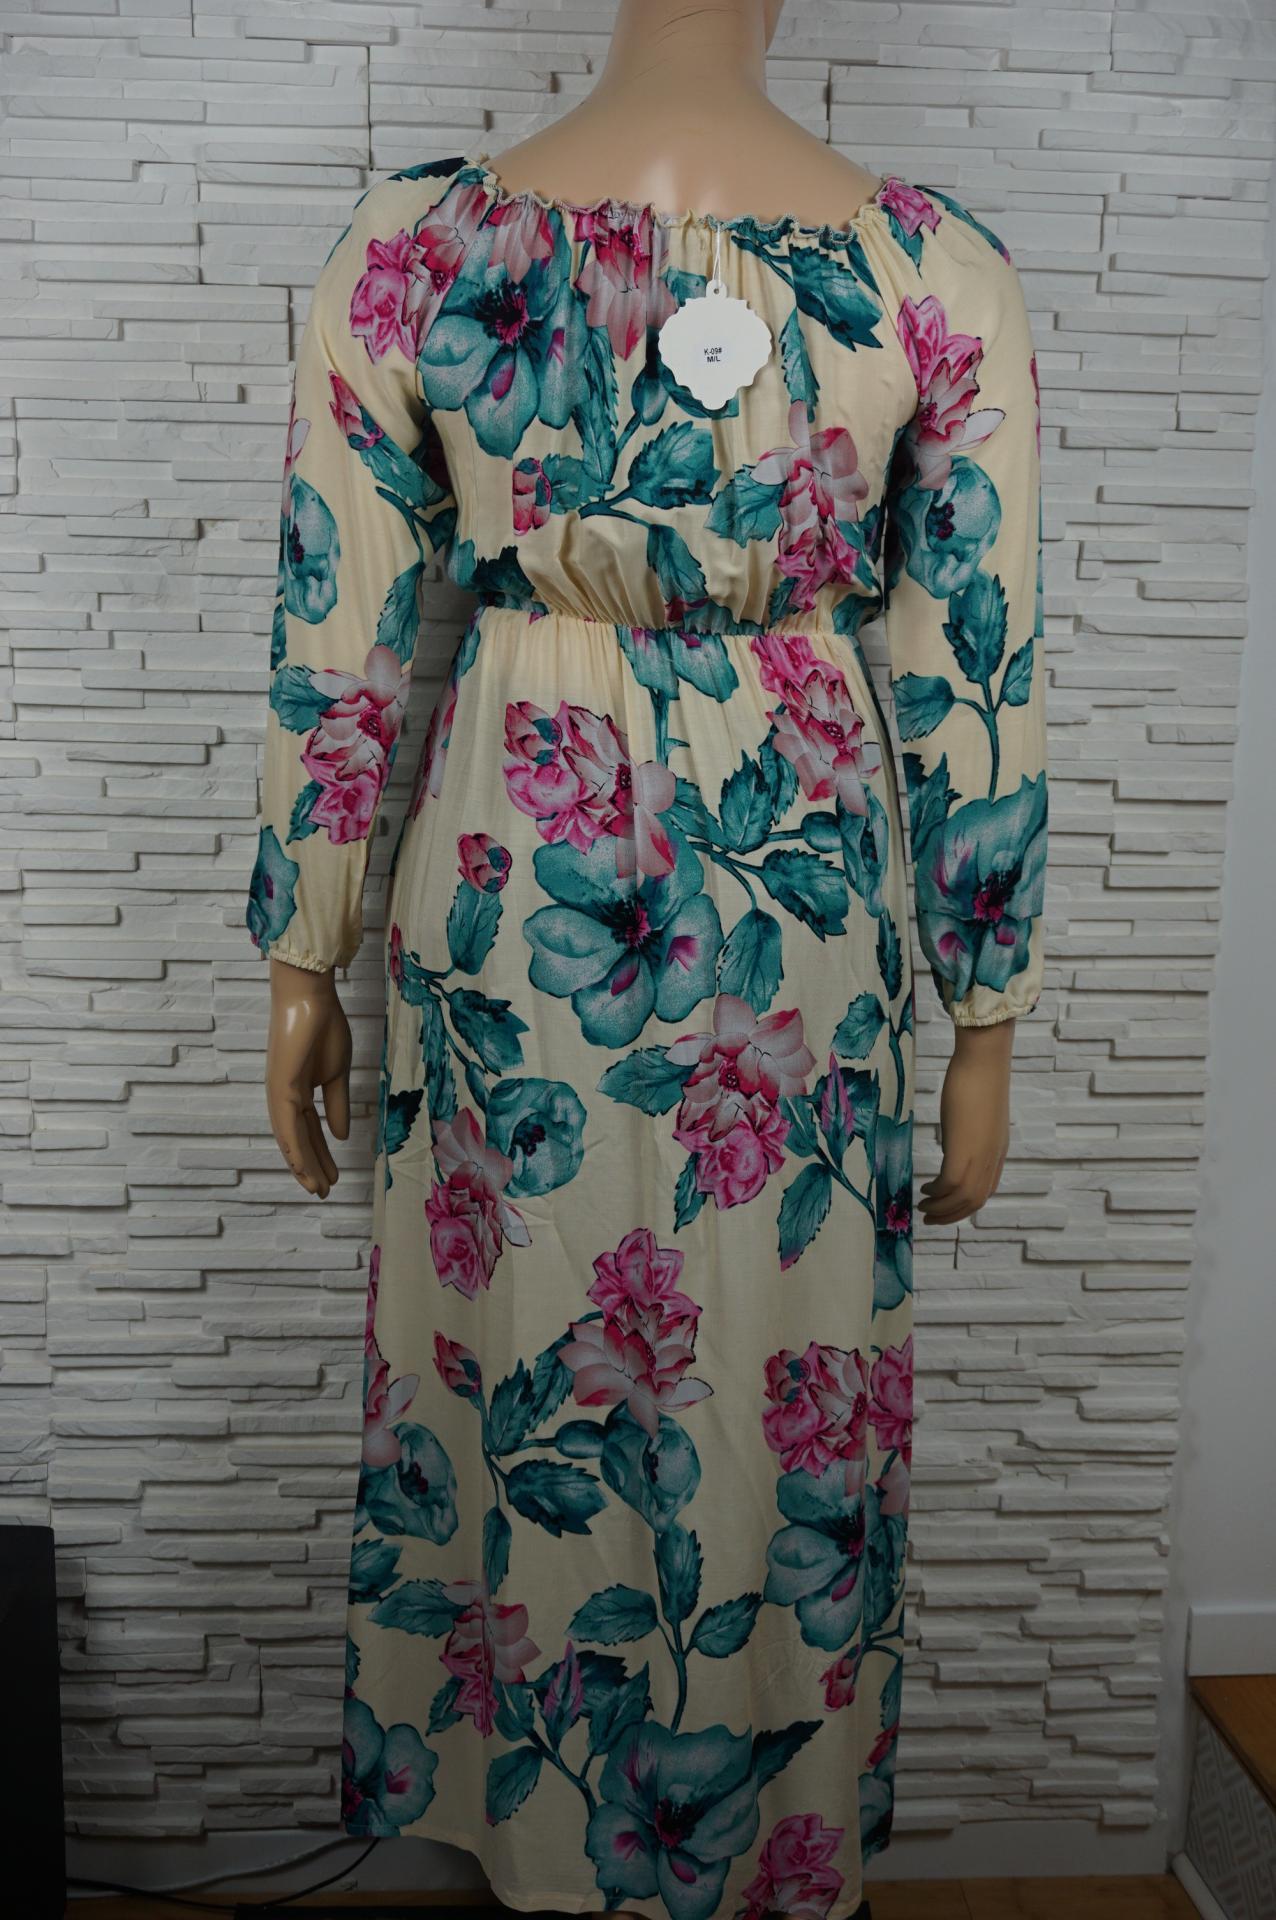 Robe longue a fleurs3